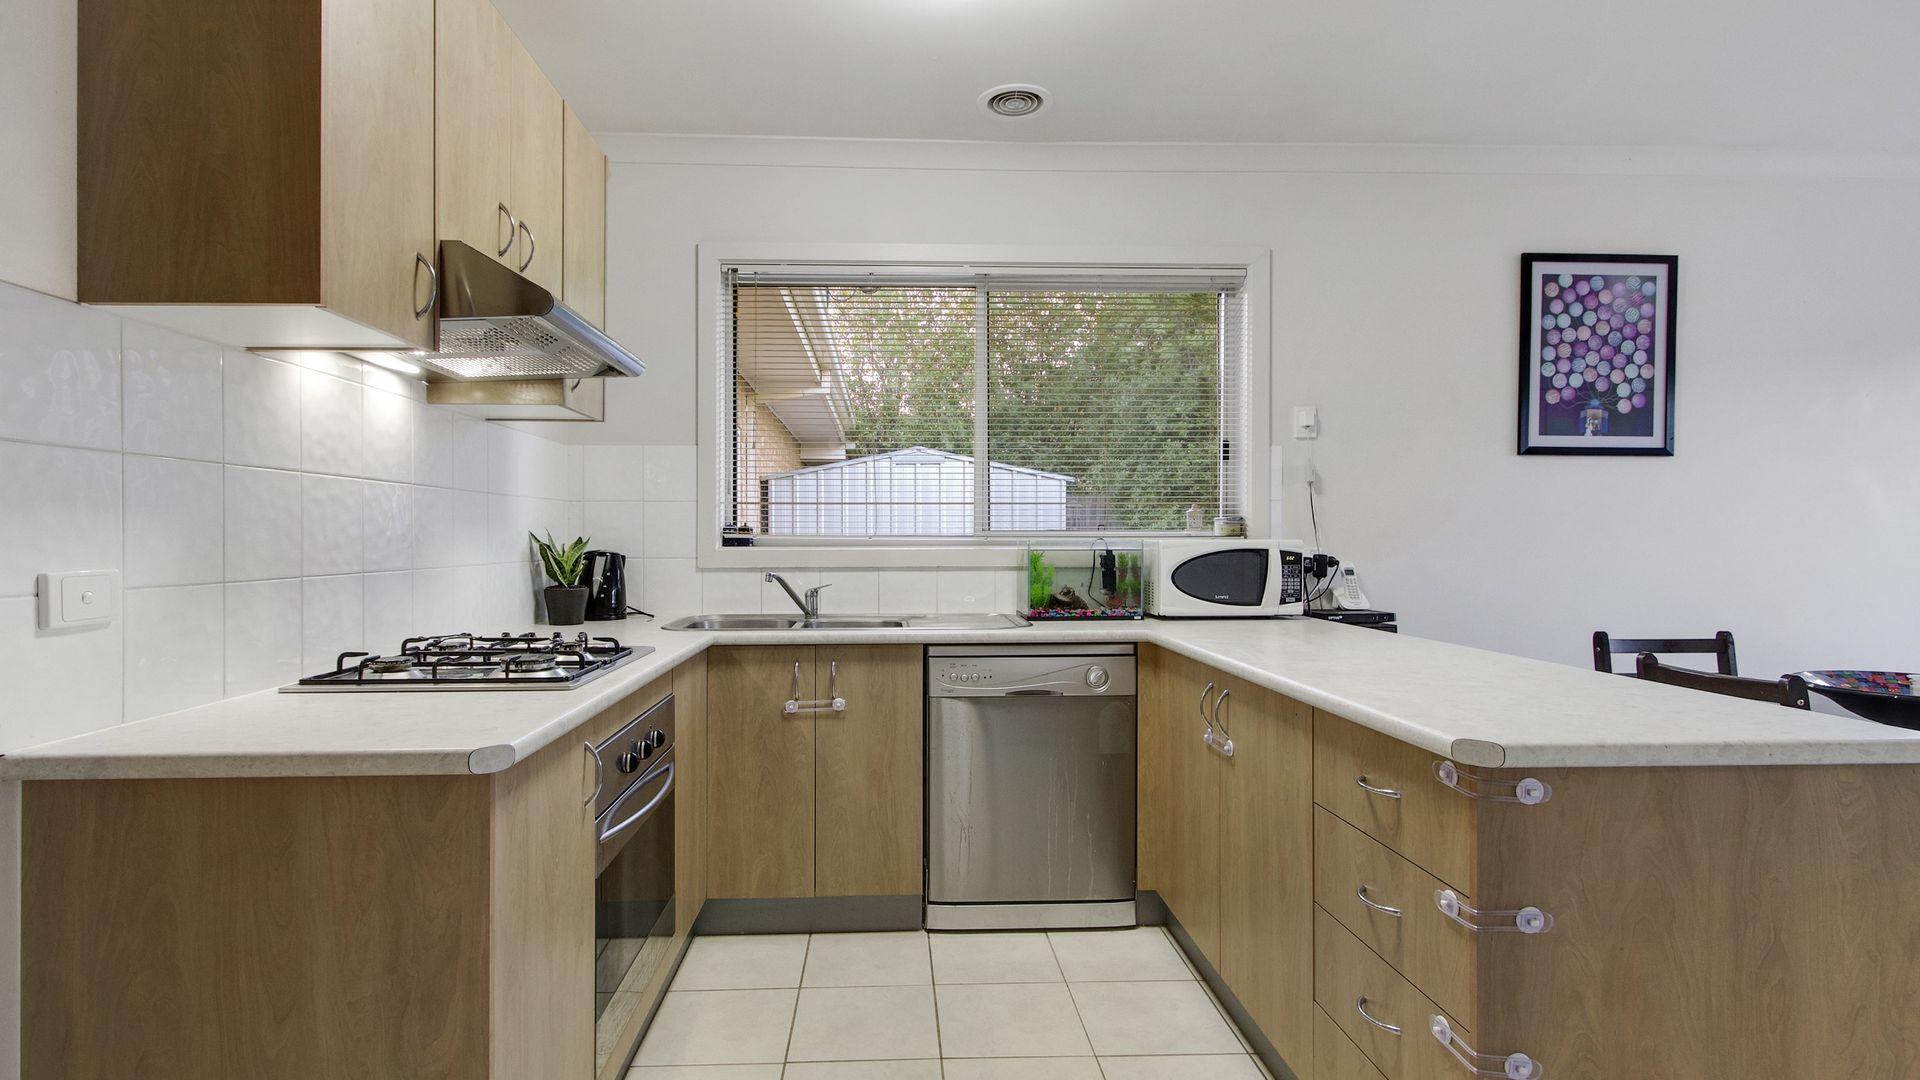 2/55 McClelland Drive, Skye VIC 3977, Image 1